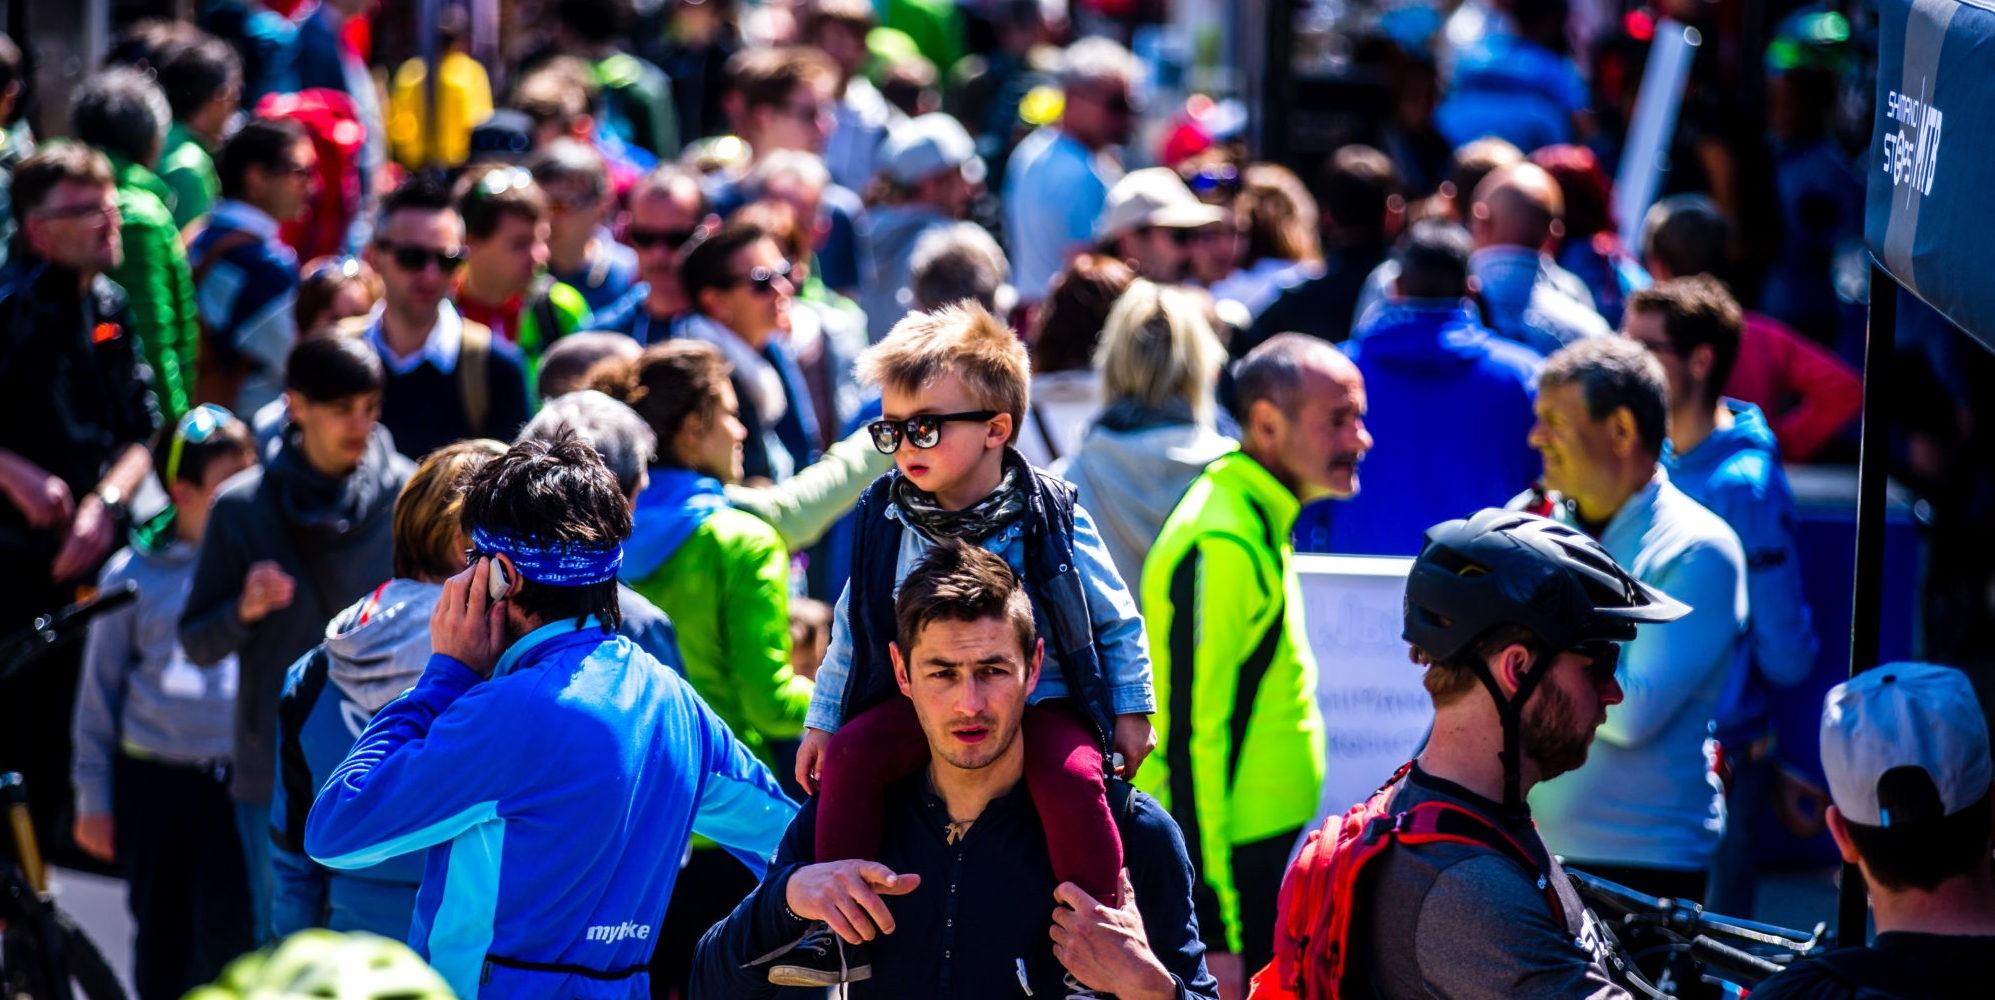 RACES2BE ||BIKE FESTIVAL SAALFELDEN LEOGANG